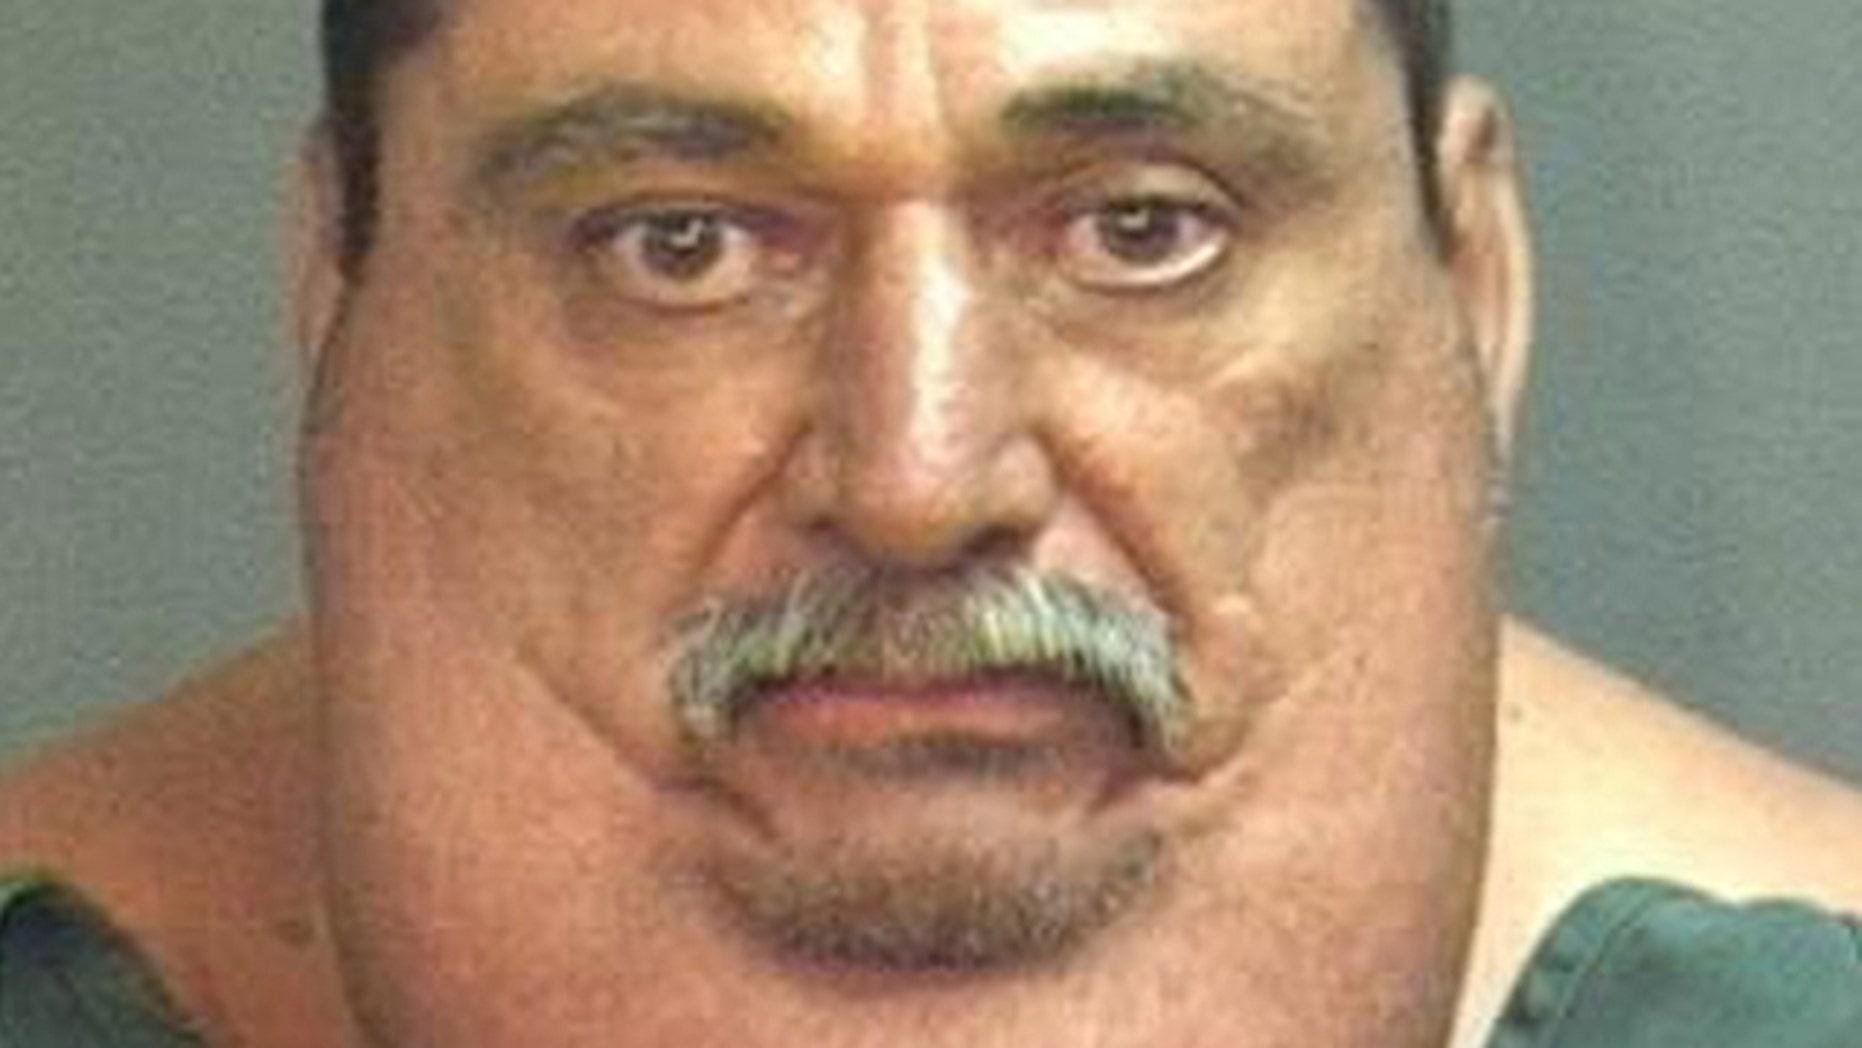 This photo provided by the Santa Ana Police Dept. shows 55-year-old Victor Joseph Espinoza.